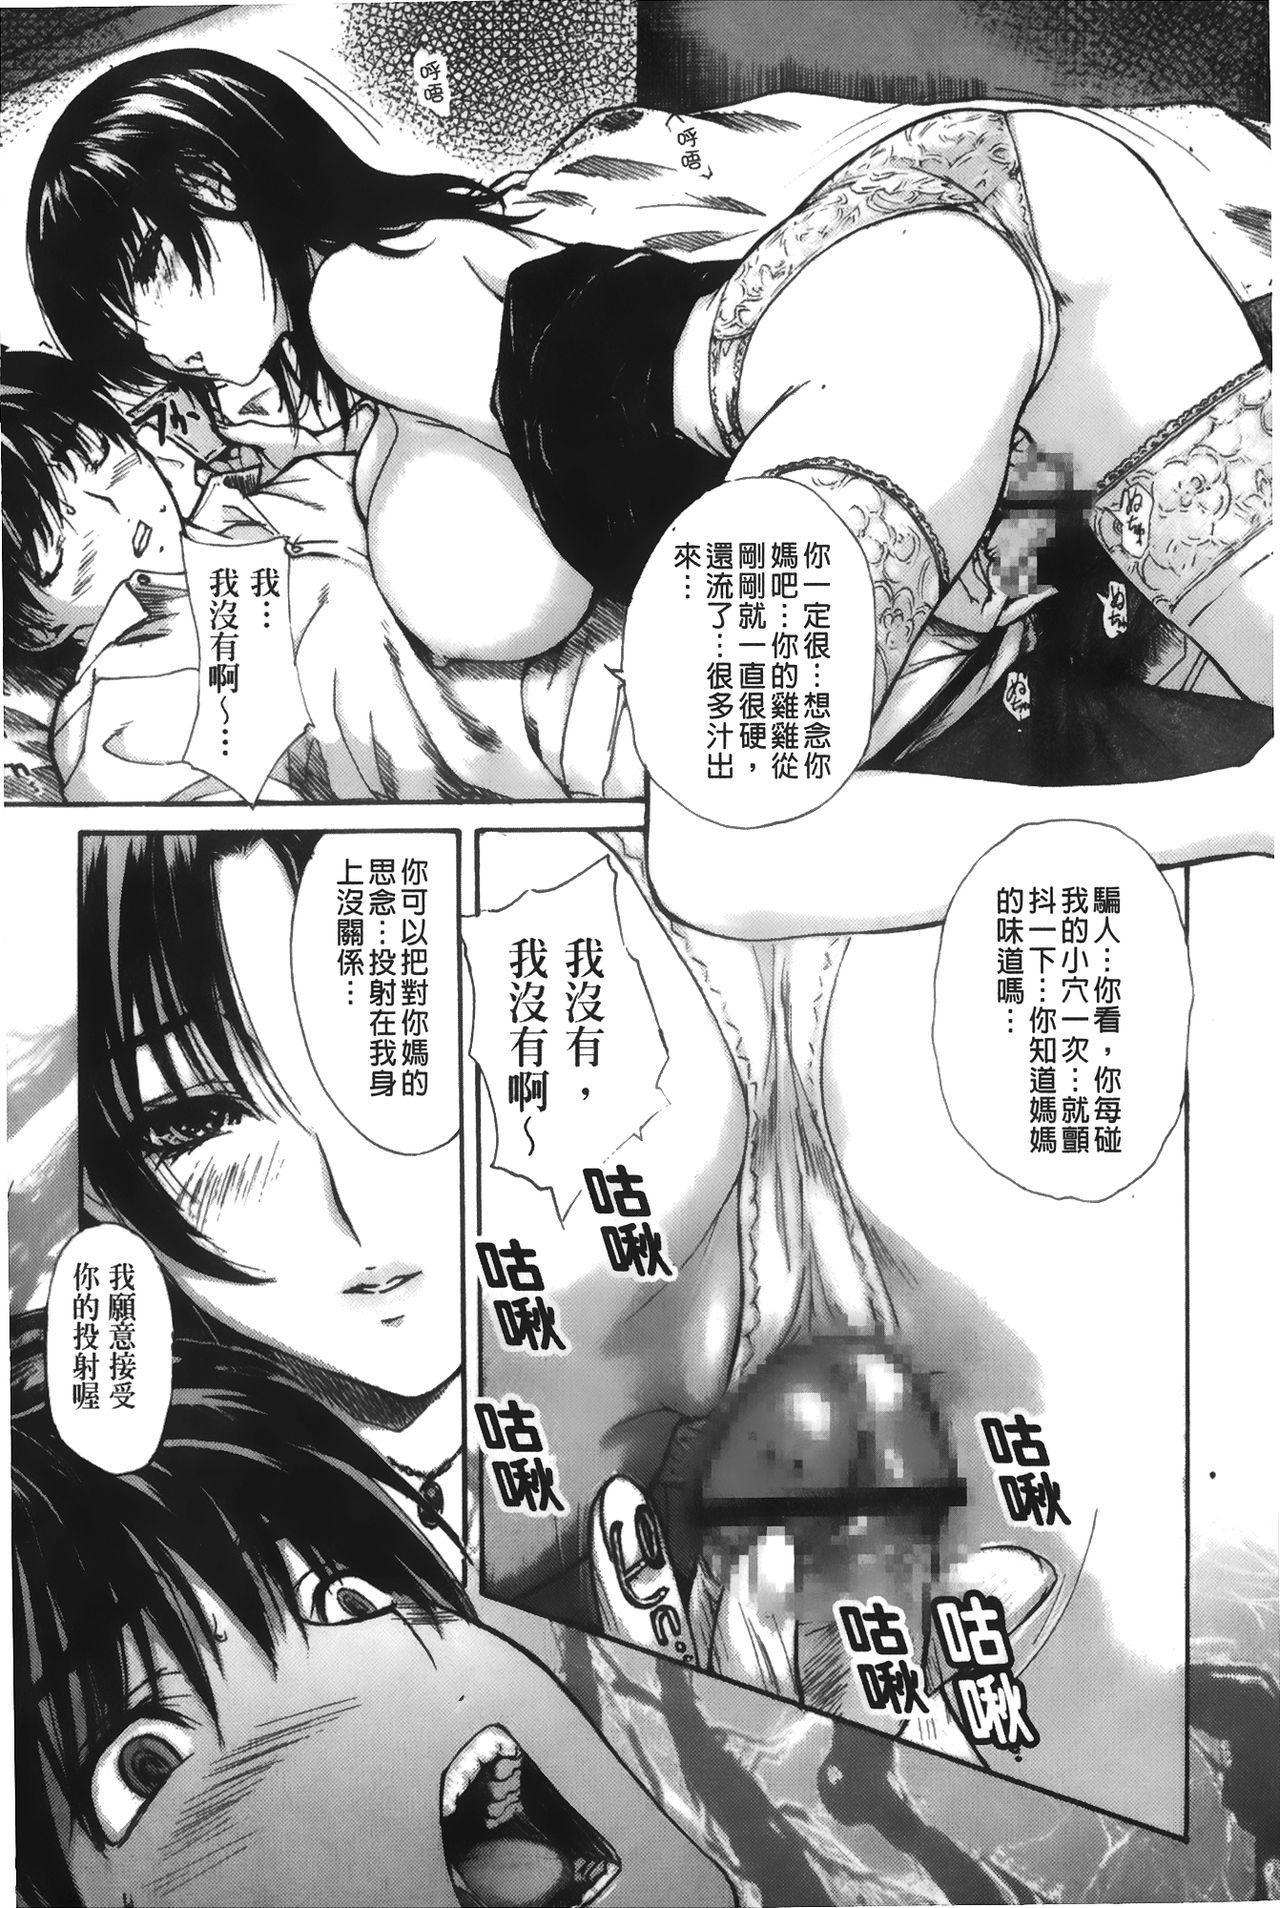 Tonari no Minano Sensei 4 | 隔壁的美奈乃老師 4 96